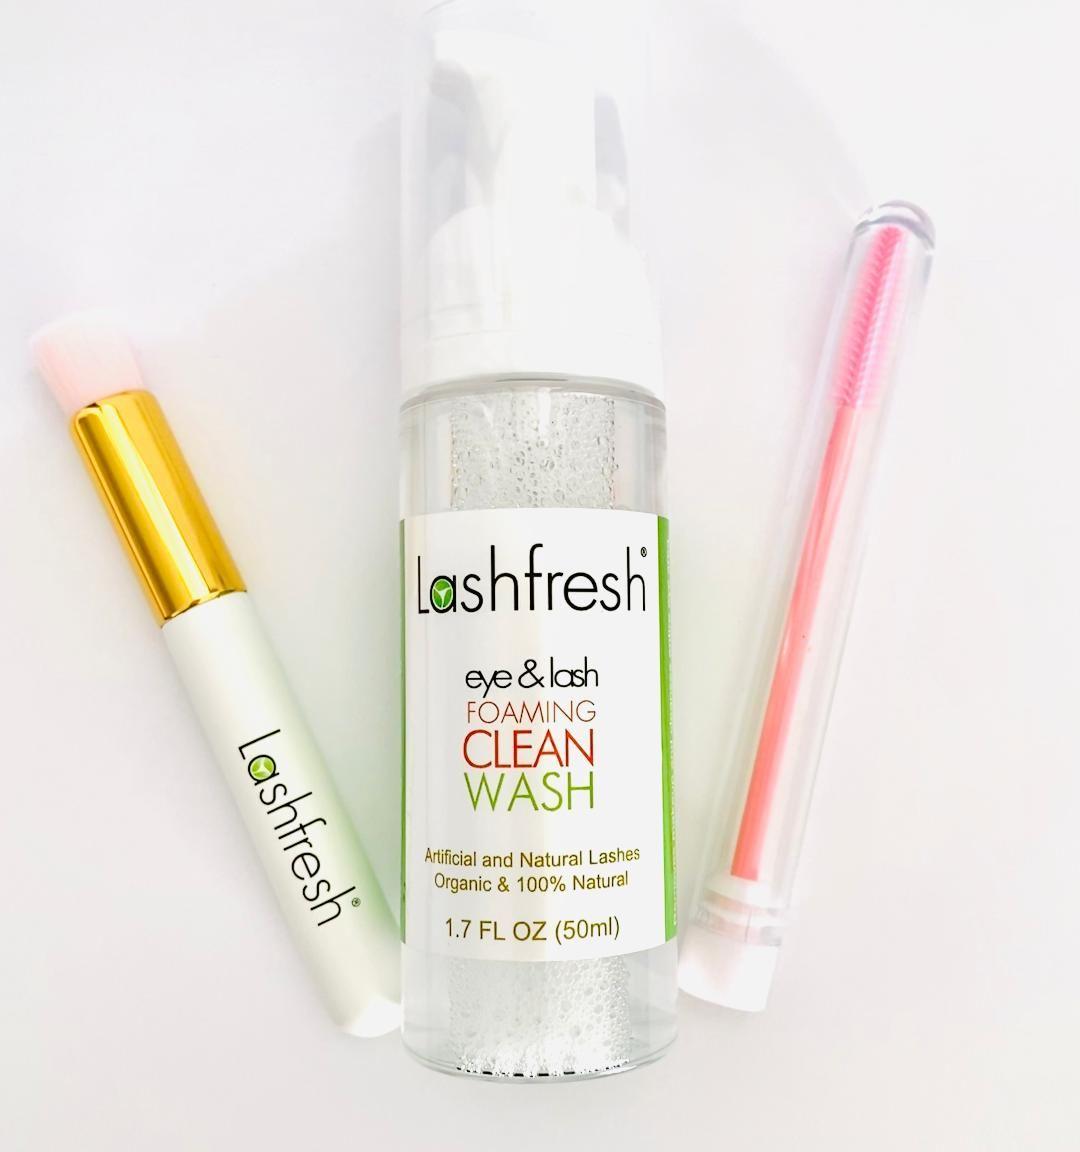 Lashfresh Foaming Clean Wash, 50ml + Lash Cleansing Brush